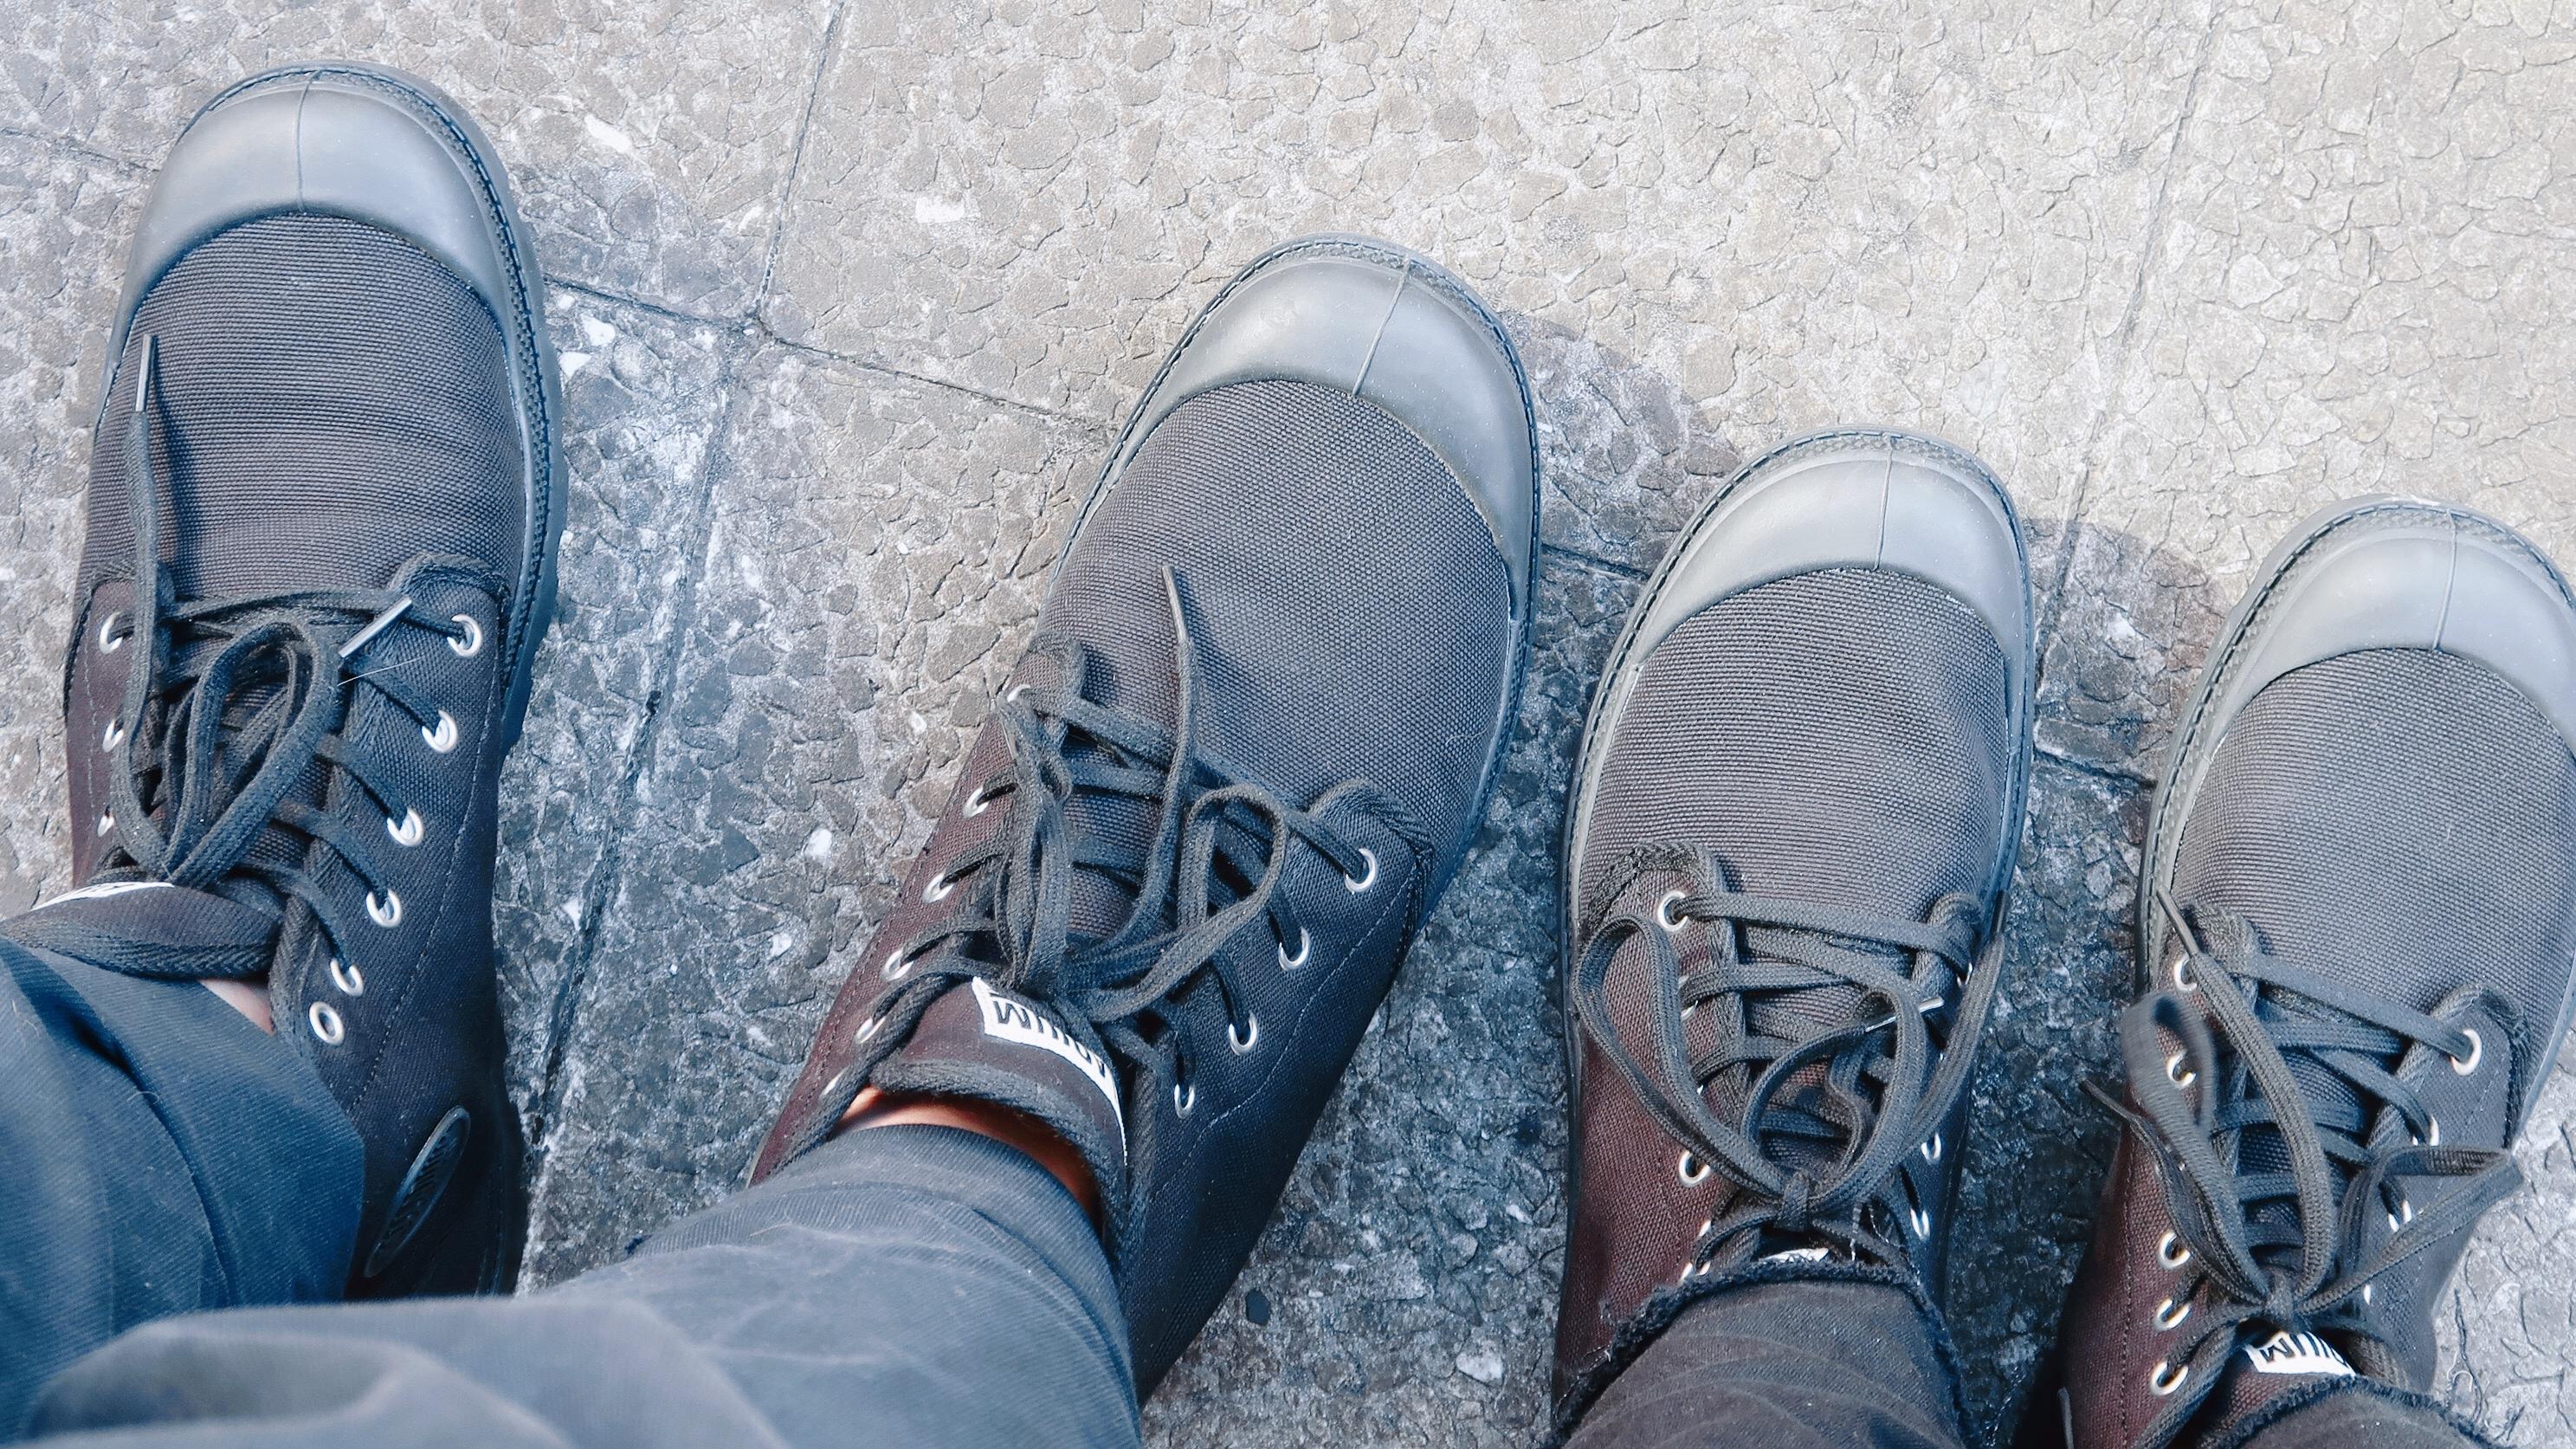 IMG_7_Palladium Boots.JPG